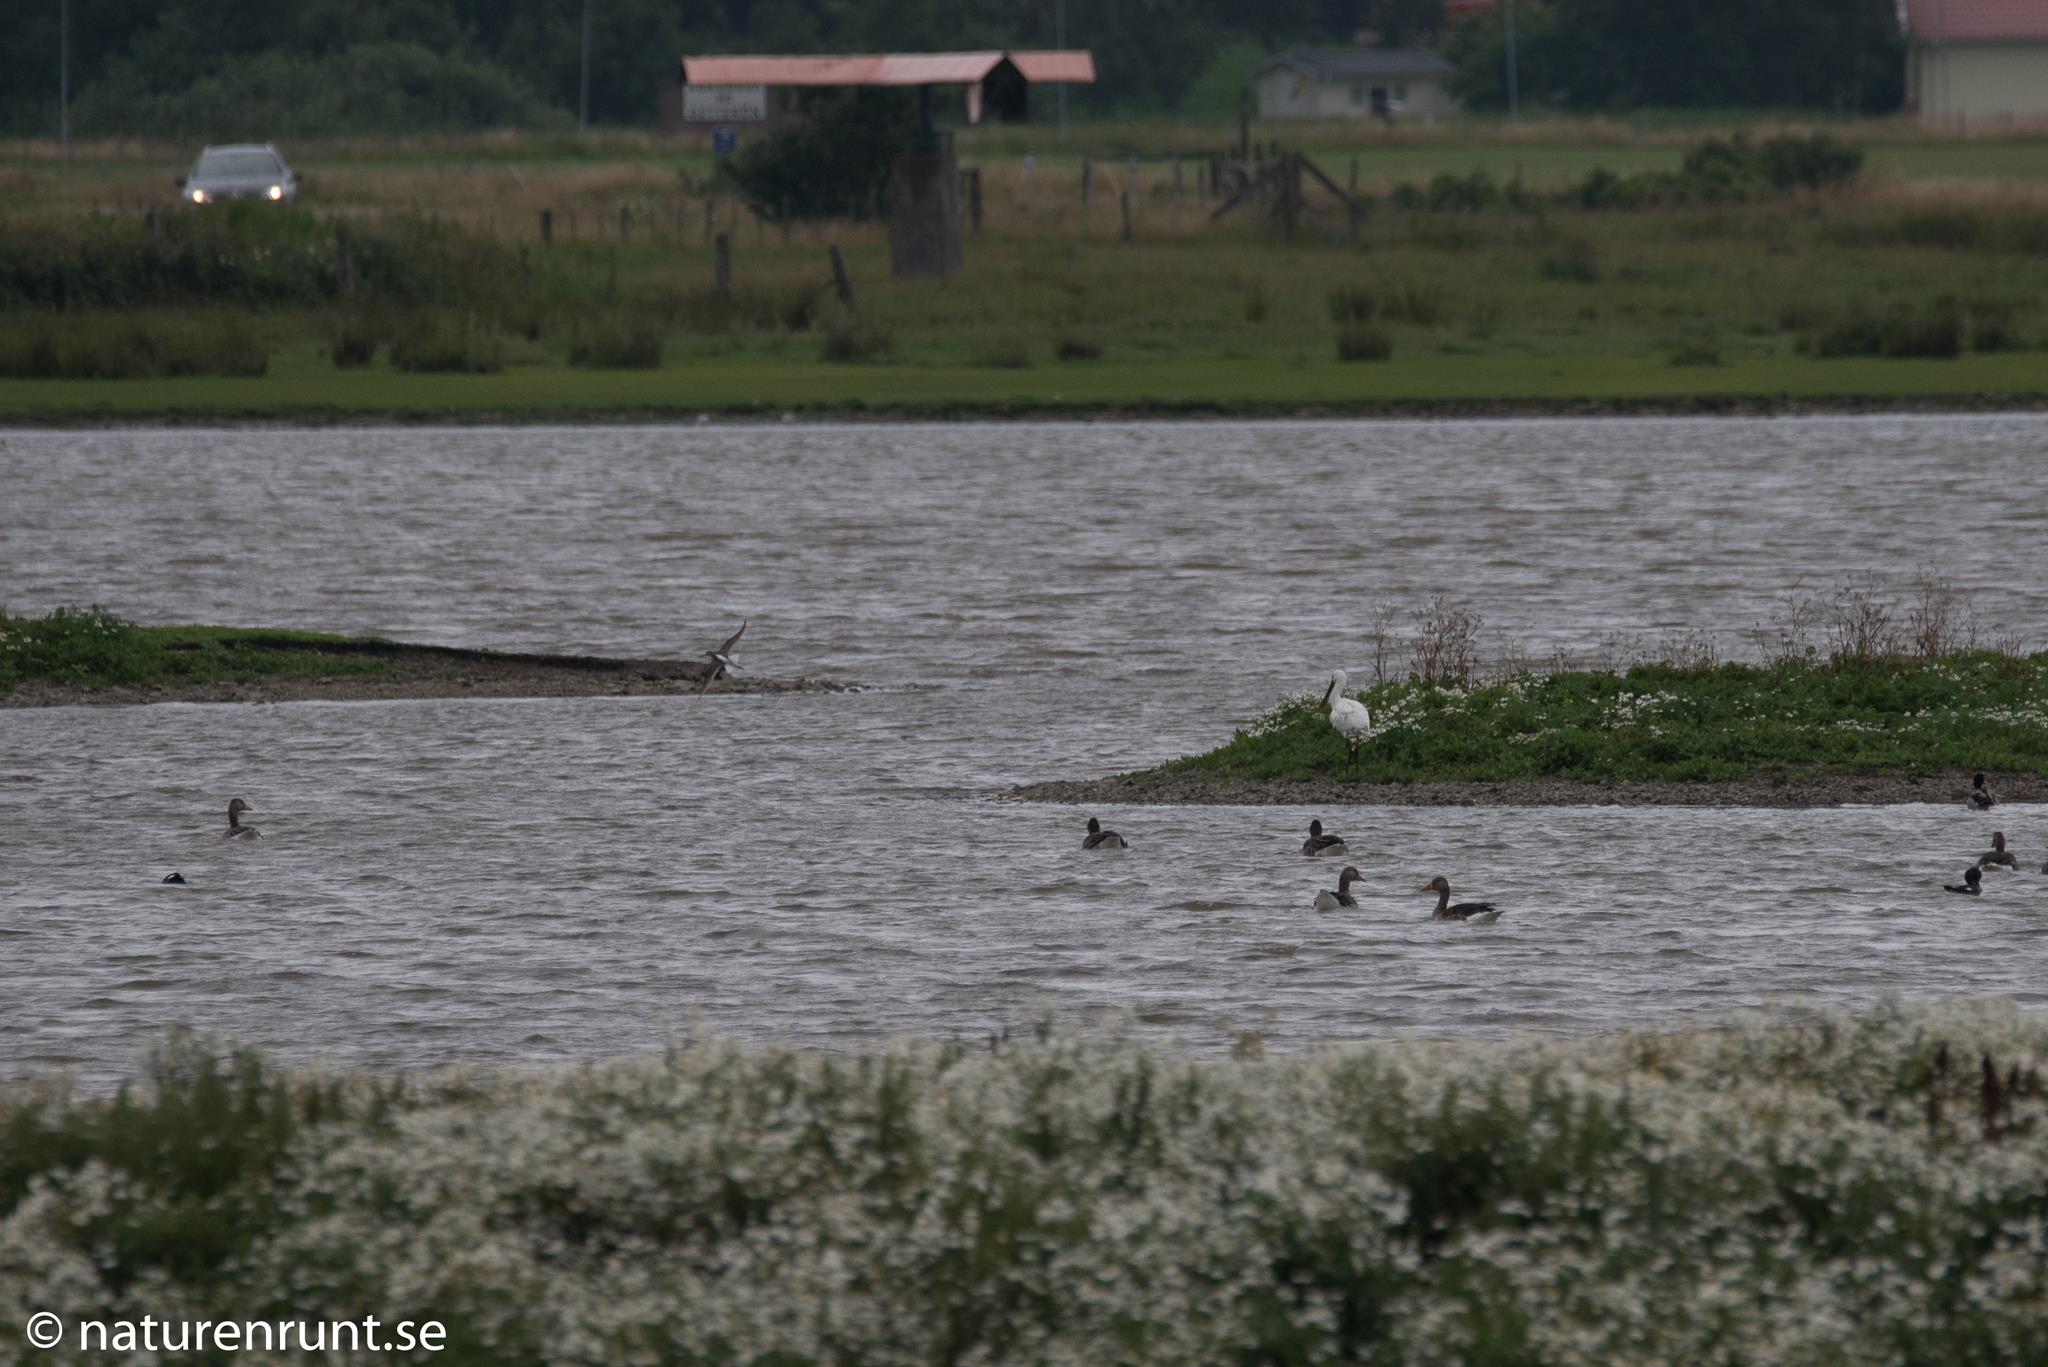 Skedstork - Vilar på ön i stora dammen